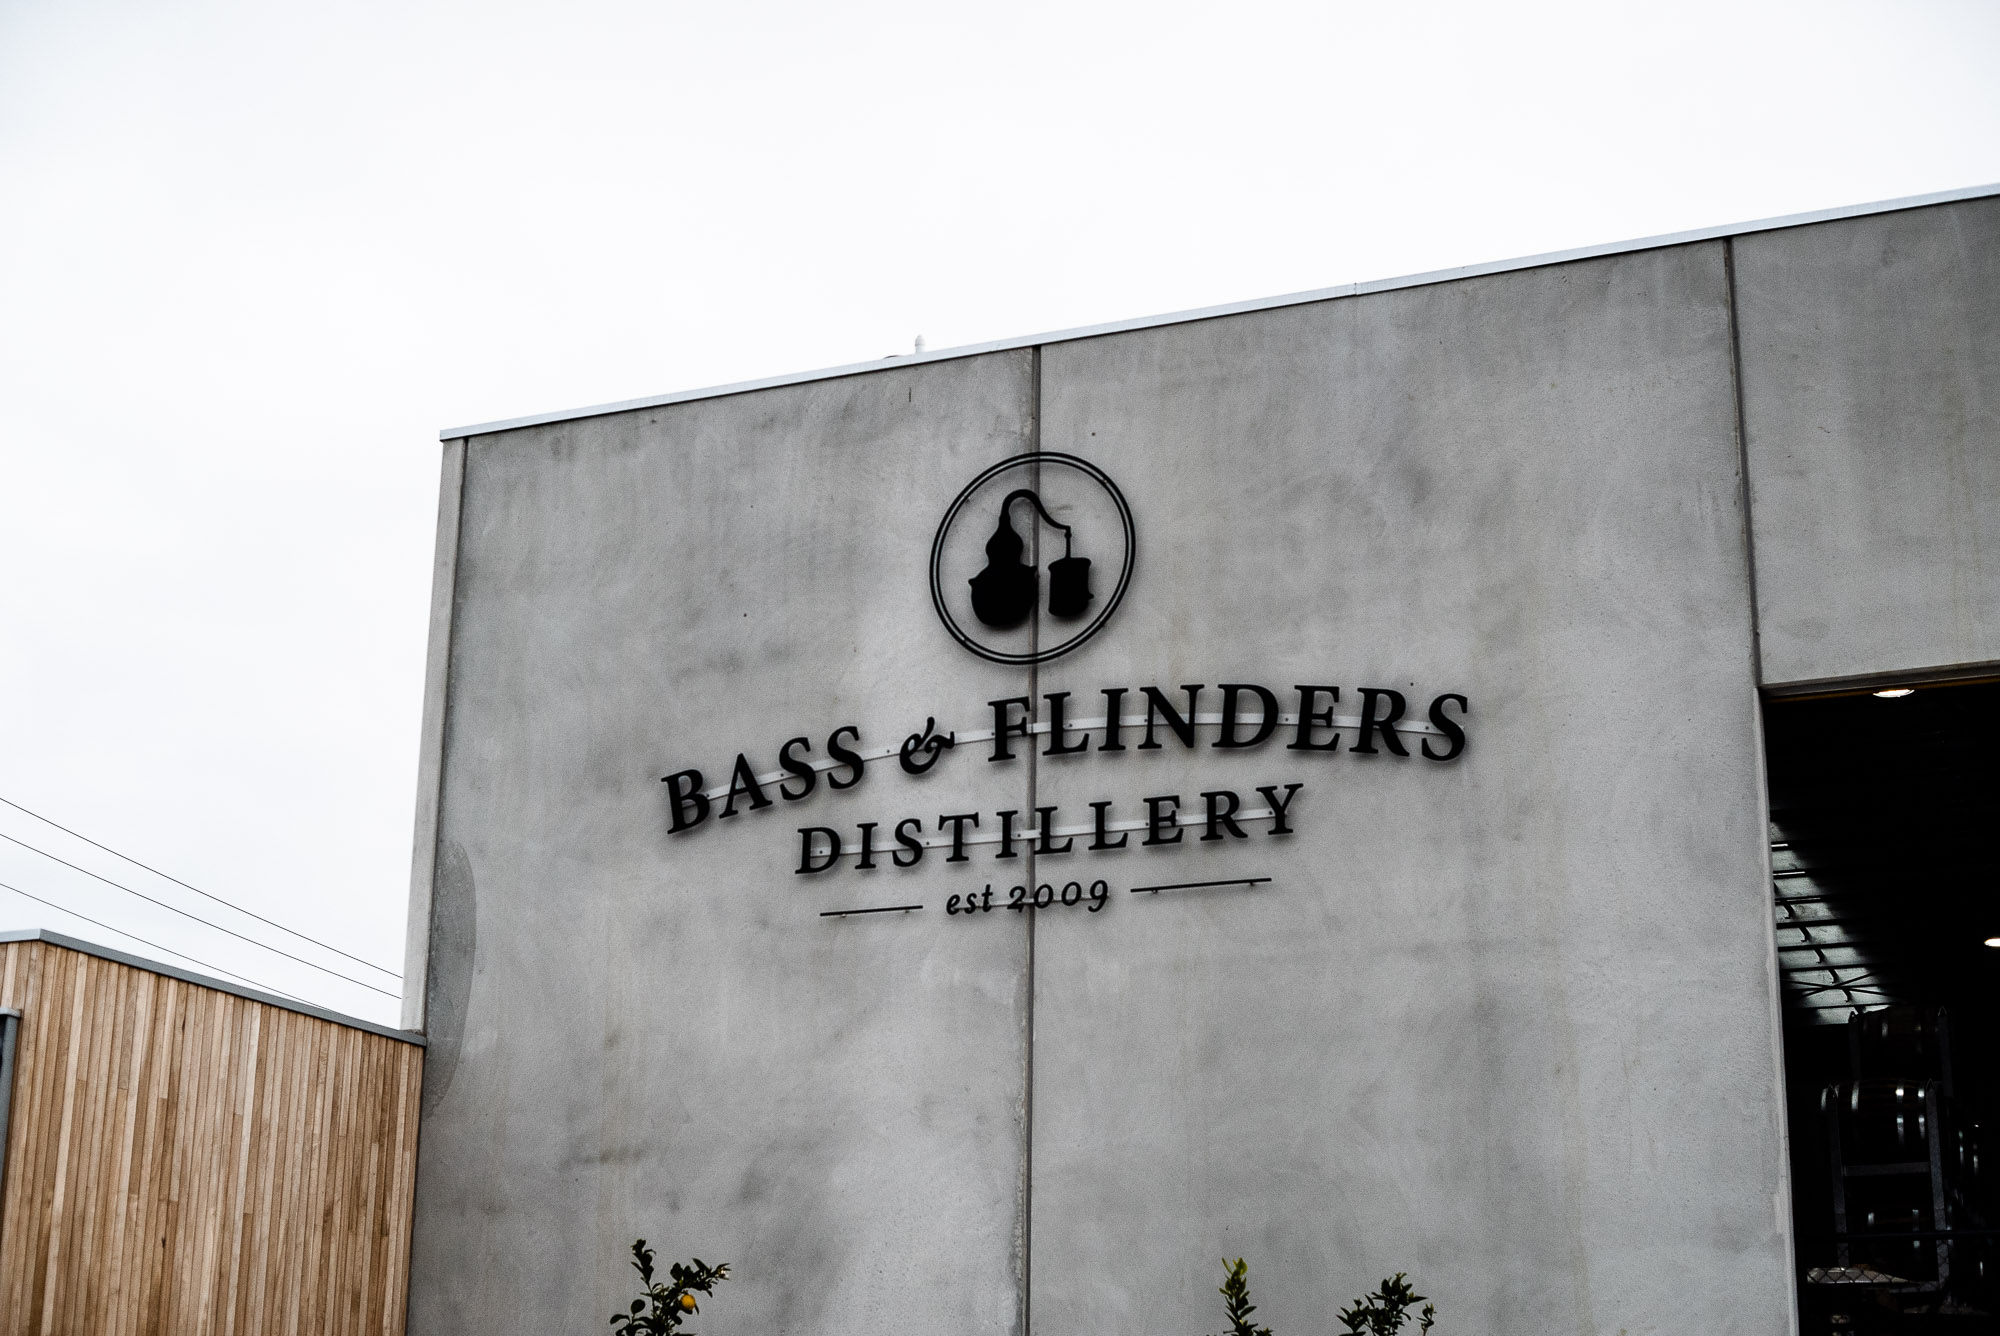 Perfume Playground x Bass & Flinders Distillery